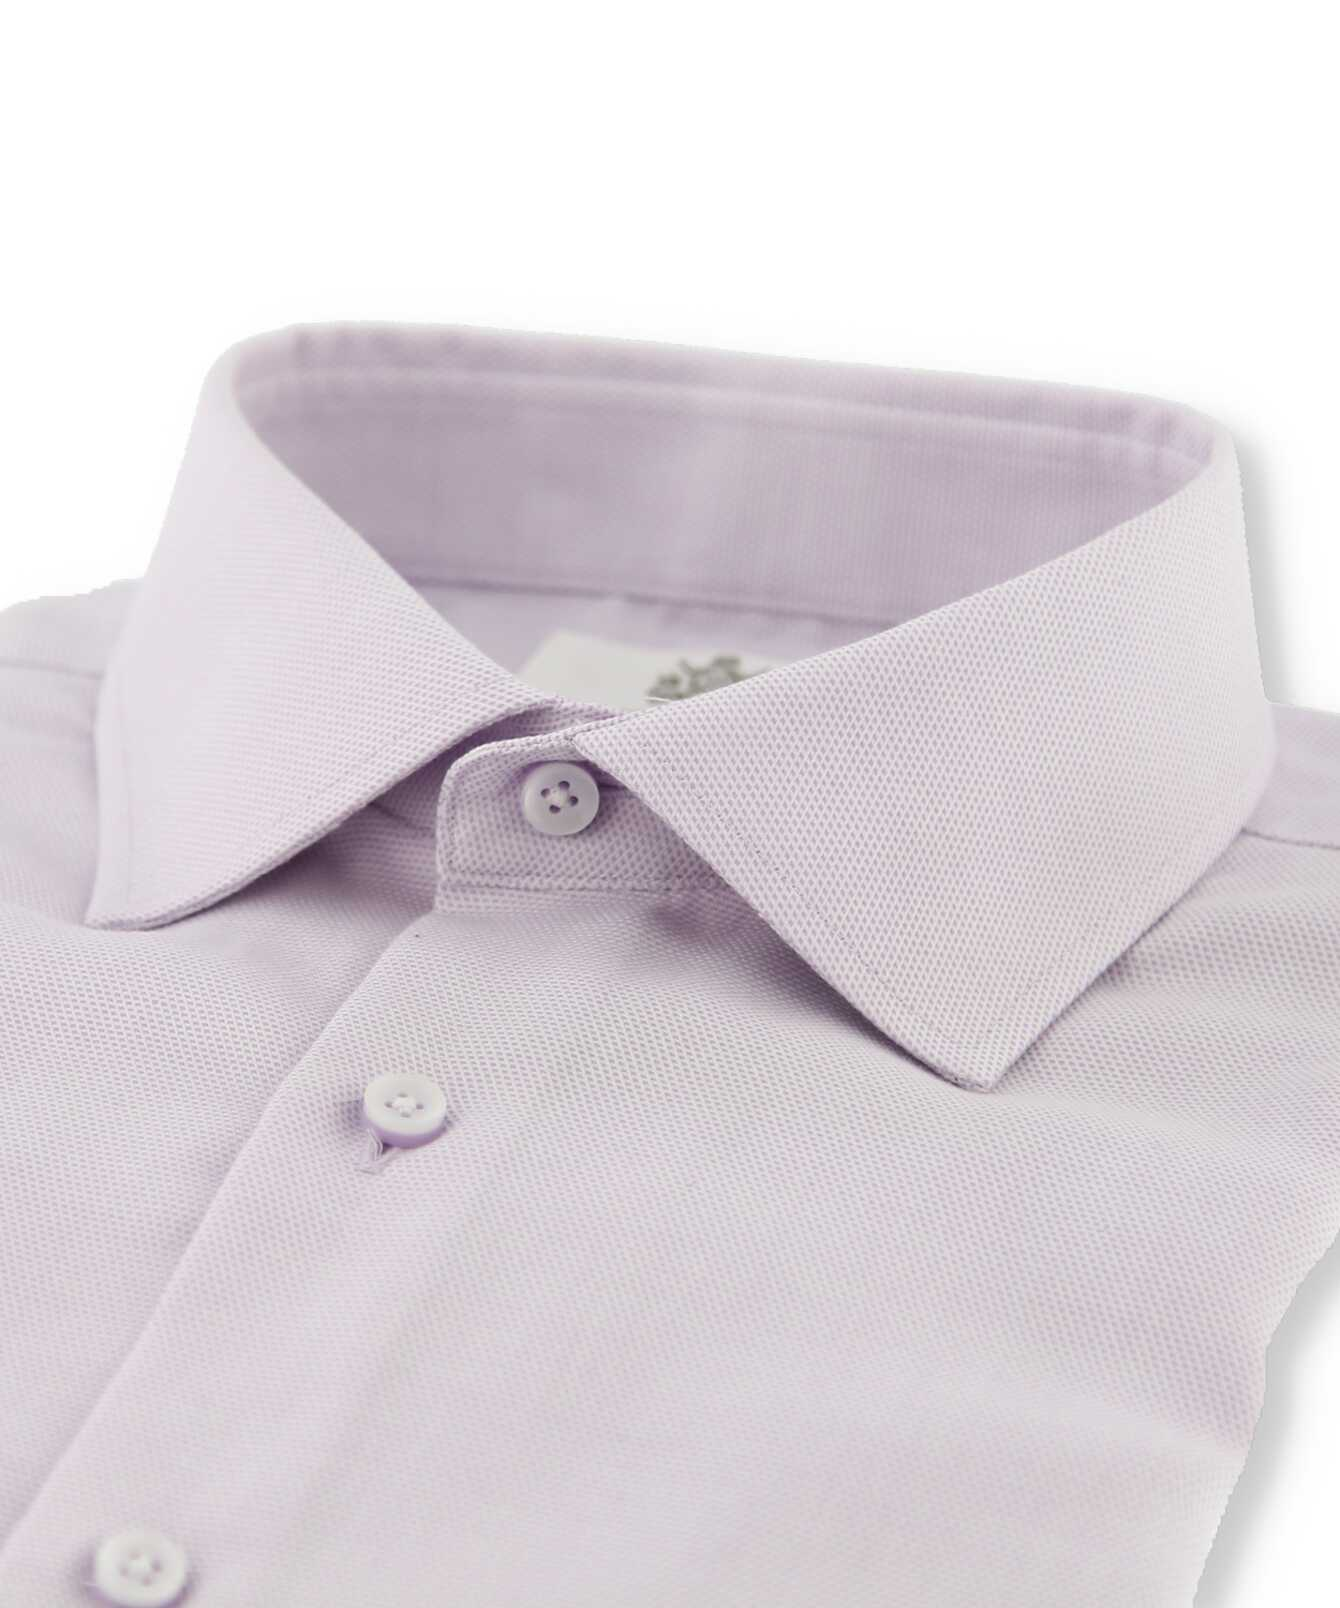 Skjorta Paramount Lättstruken The Shirt Factory